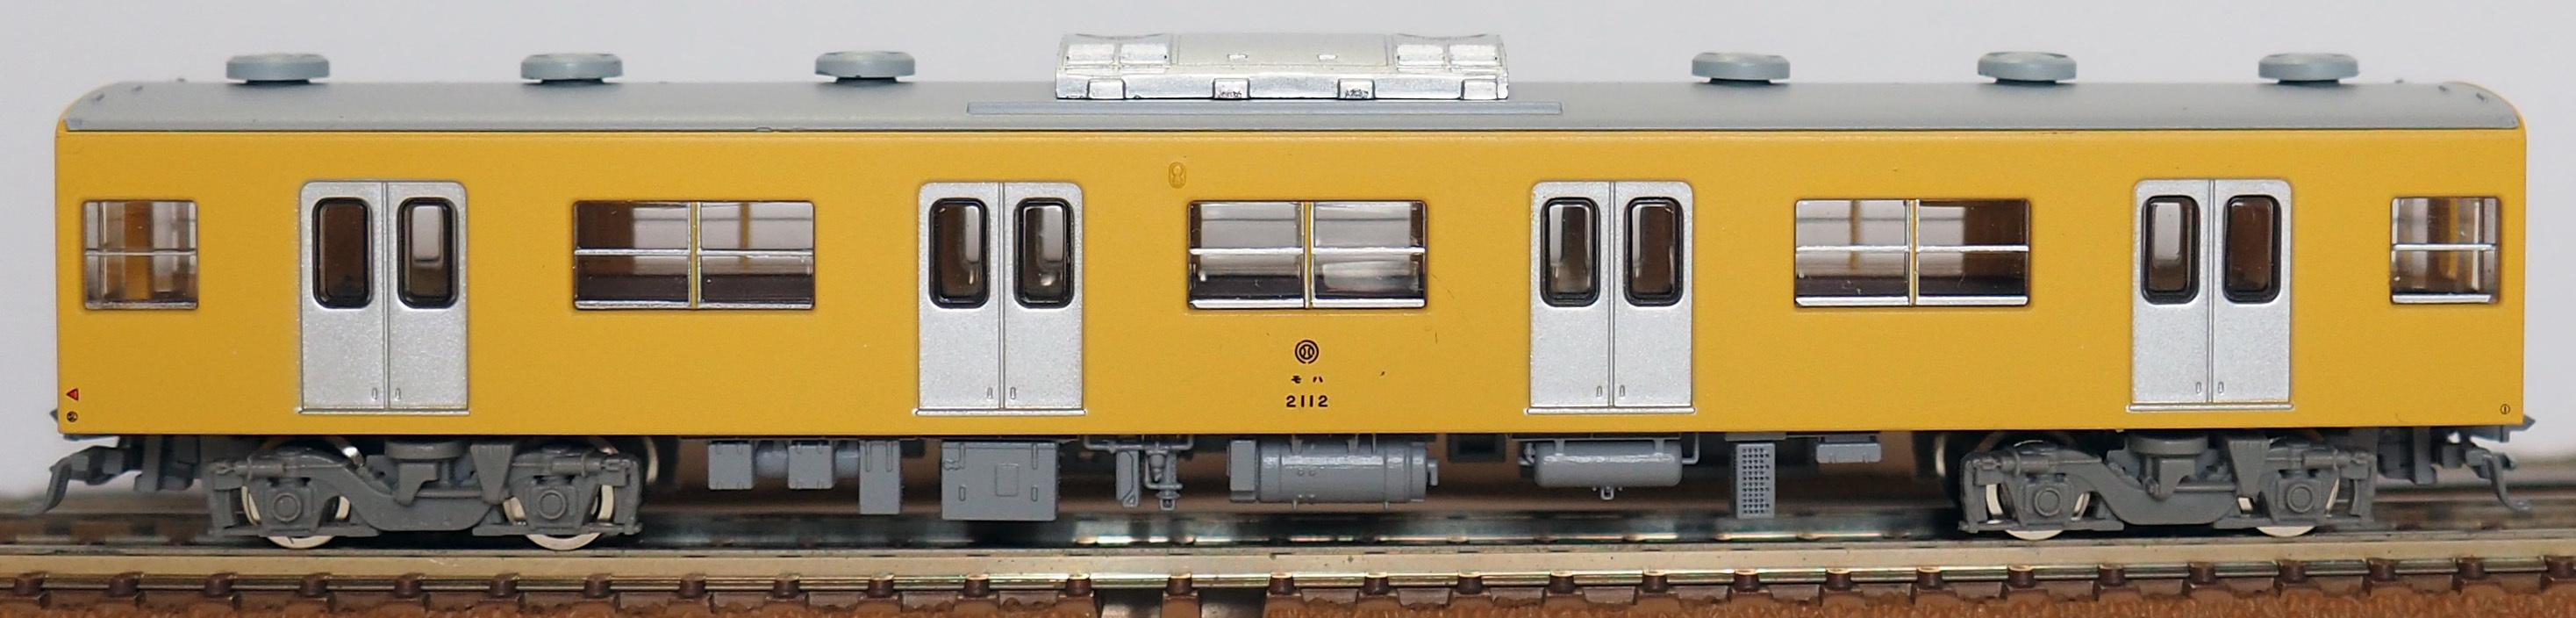 P4221493.jpg